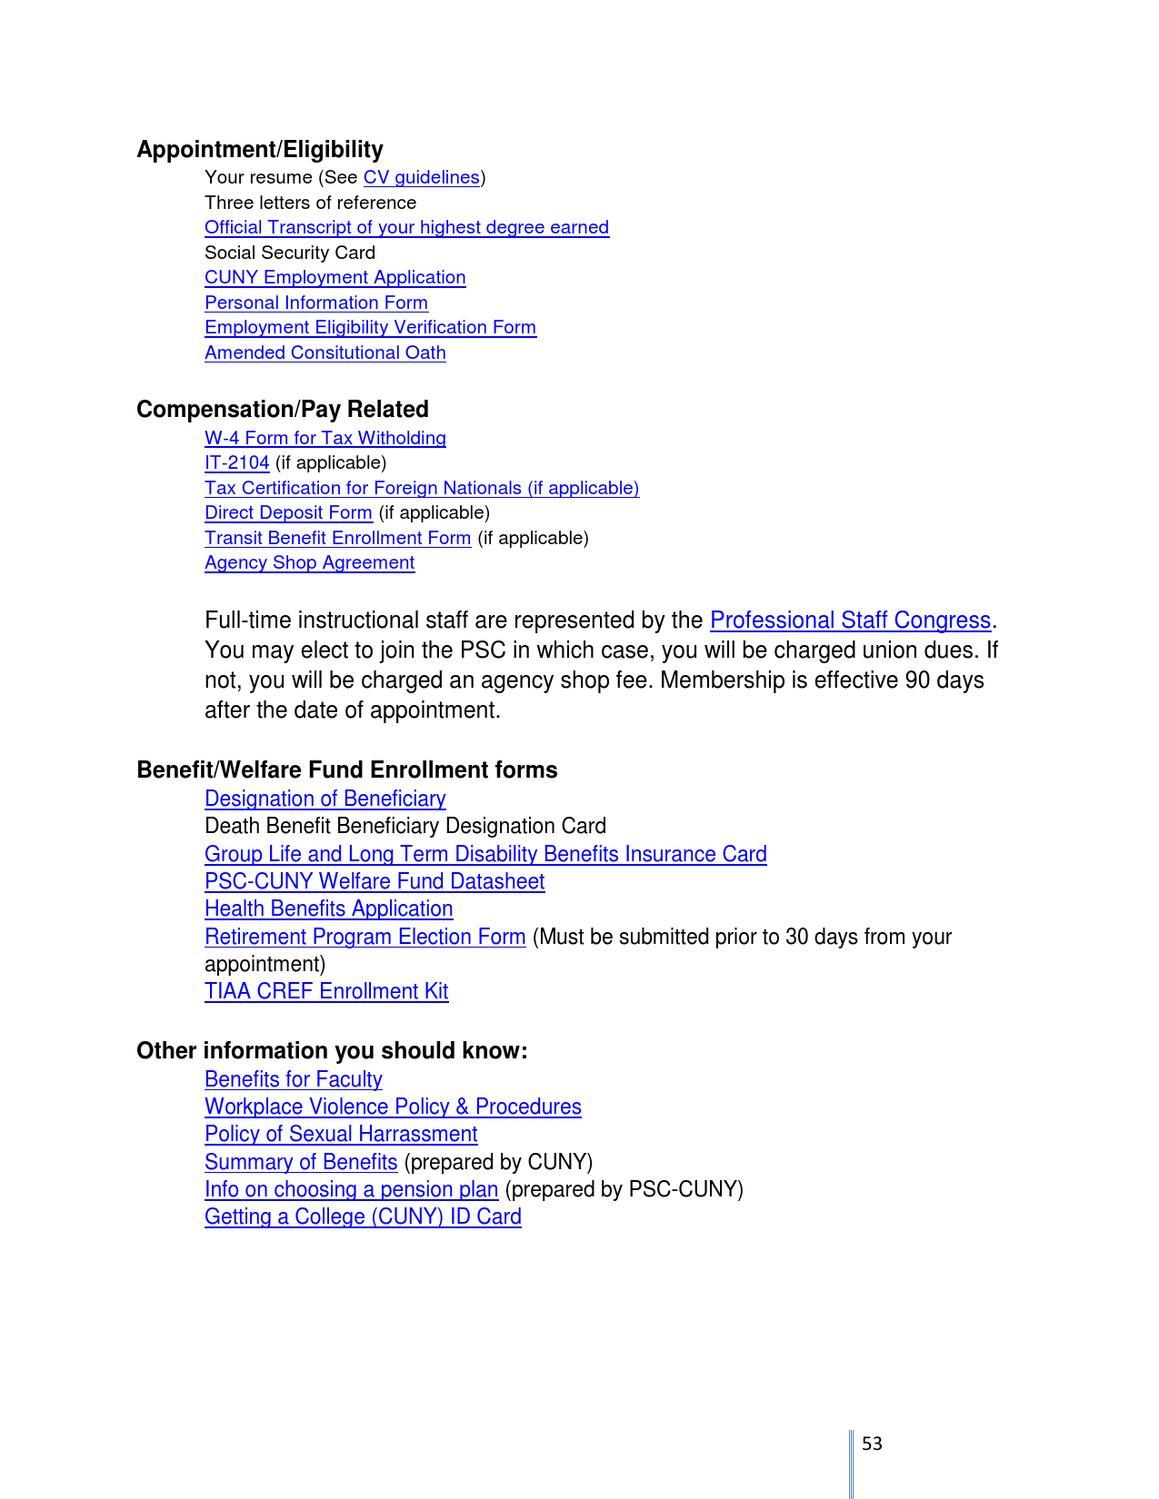 Faculty Handbook Mldbmcc Def By Modern Languages Departmentbmcc